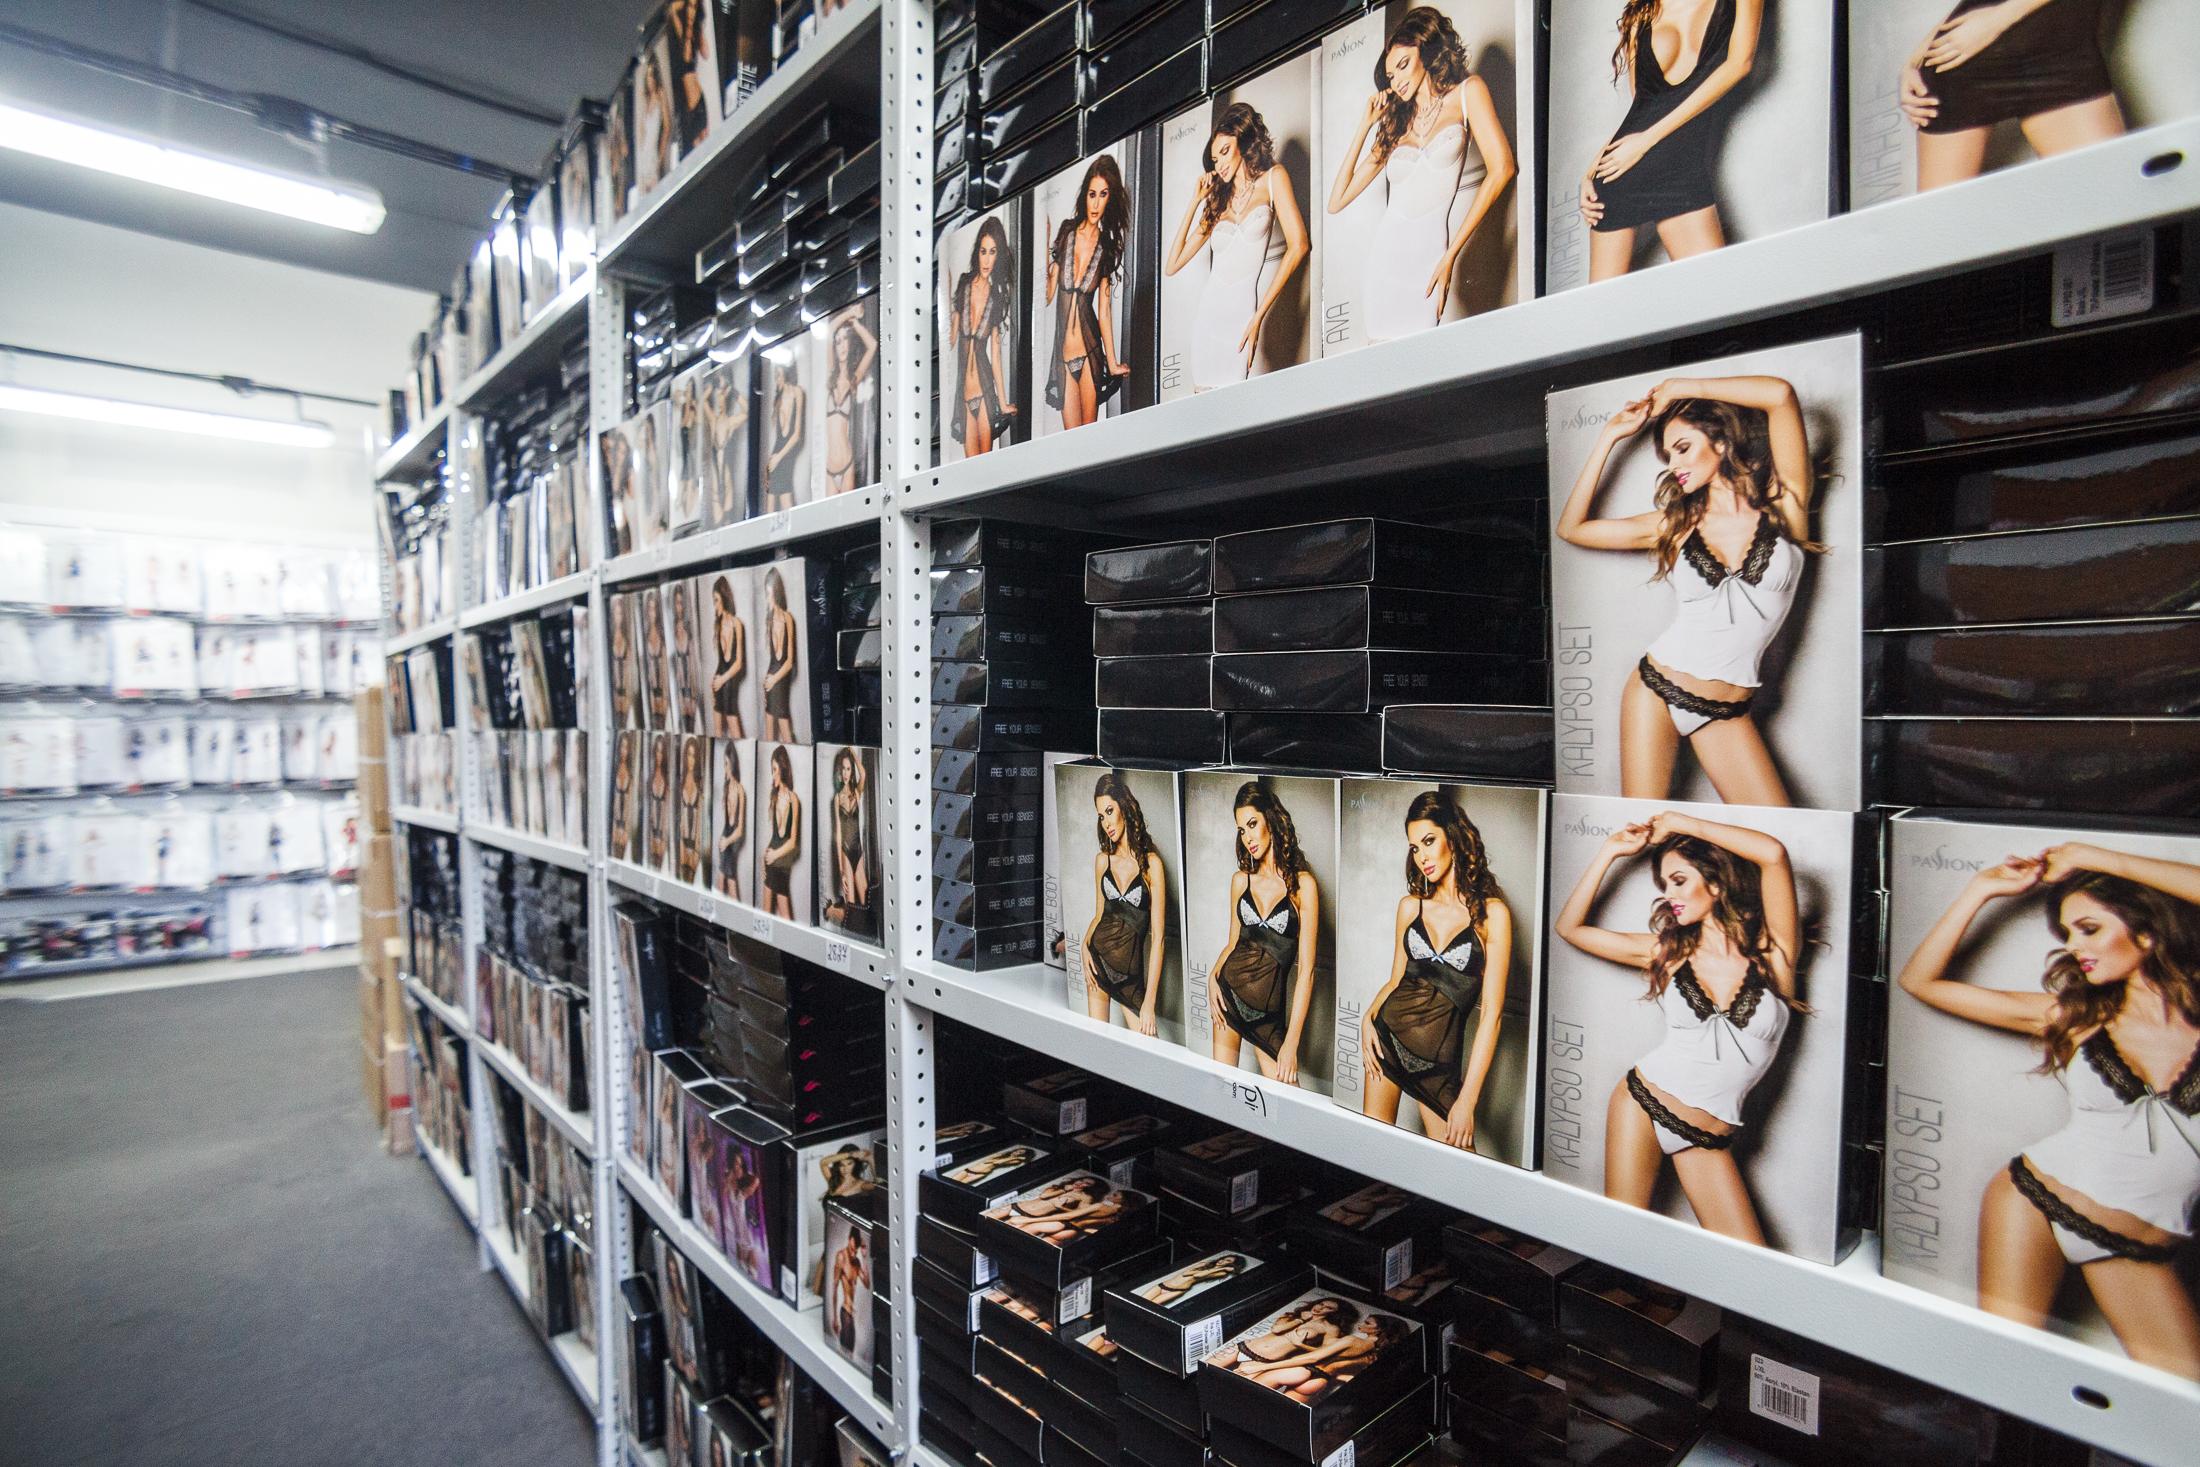 Оптовый склад секс товары